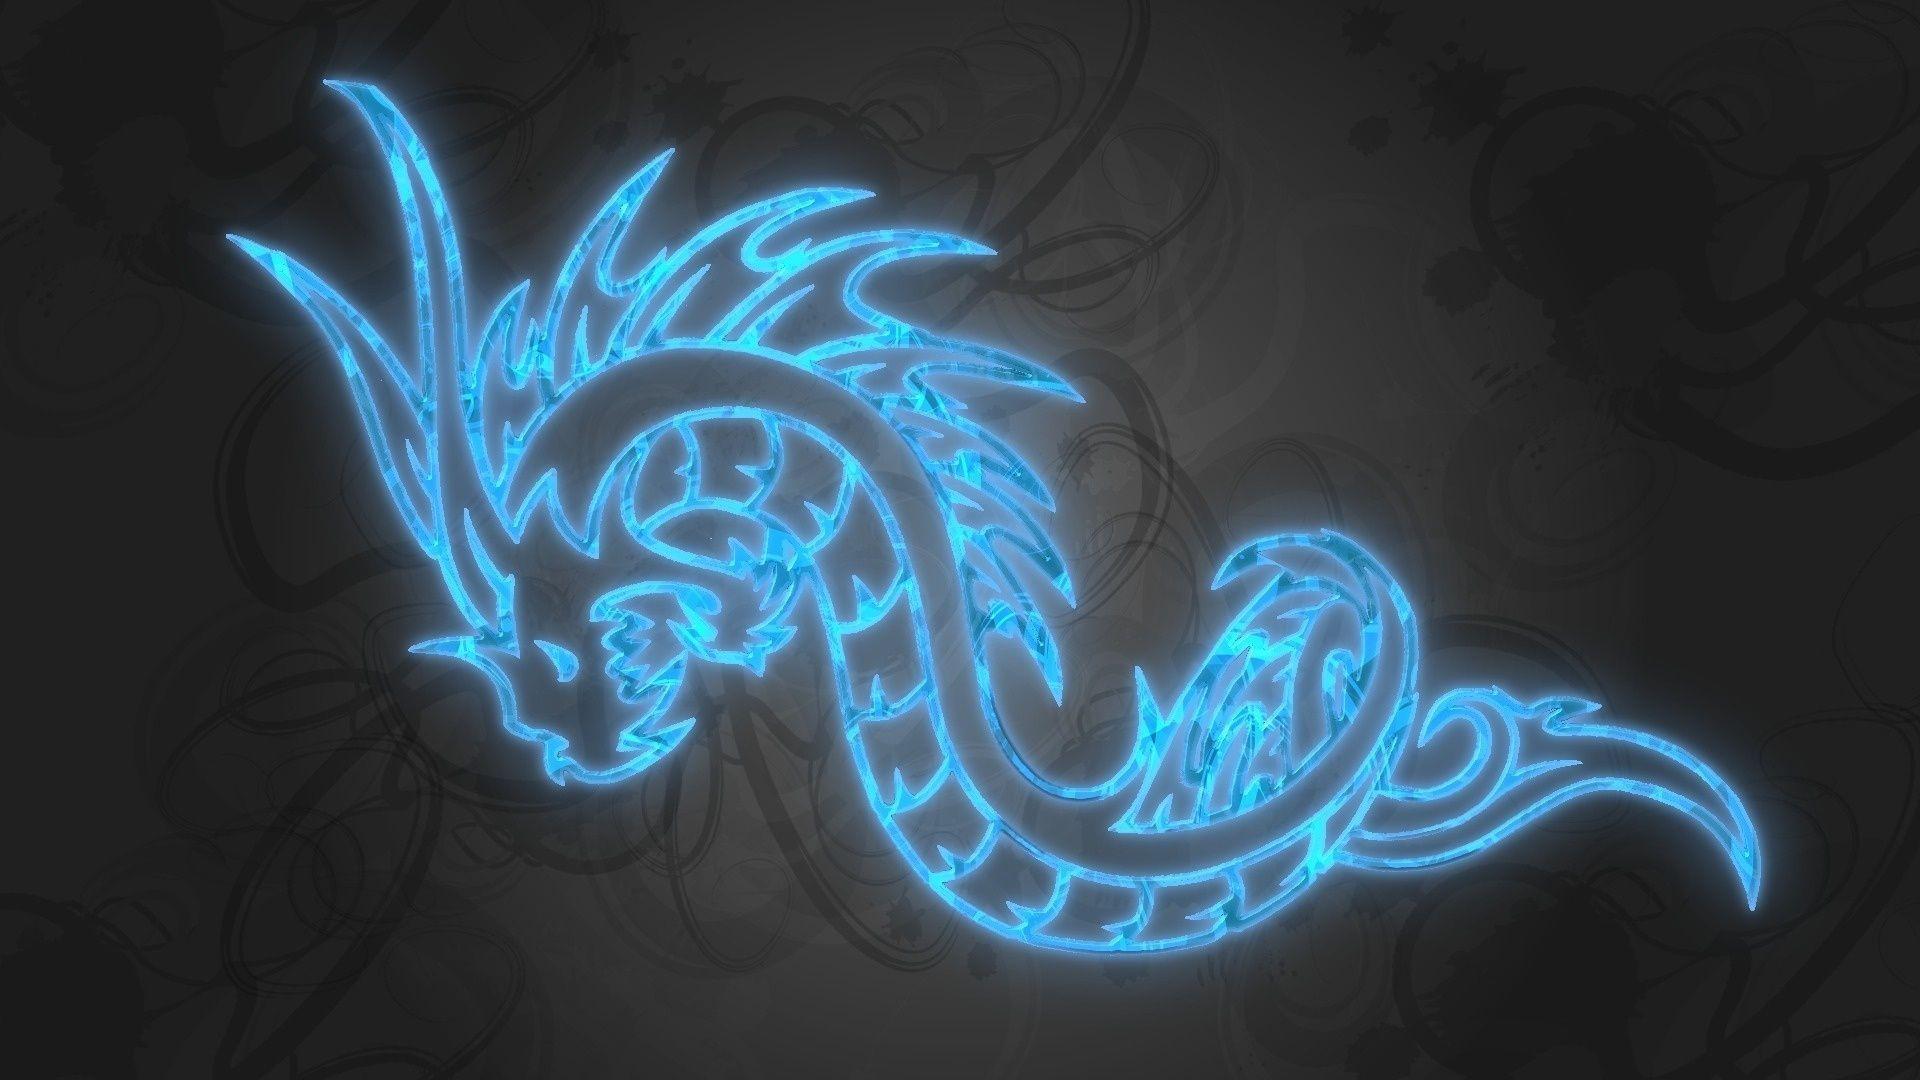 "2160x3840 Dragon Iphone Wallpaper Hd Images Blue Of Computer ~ Gipsypixel.com"">"